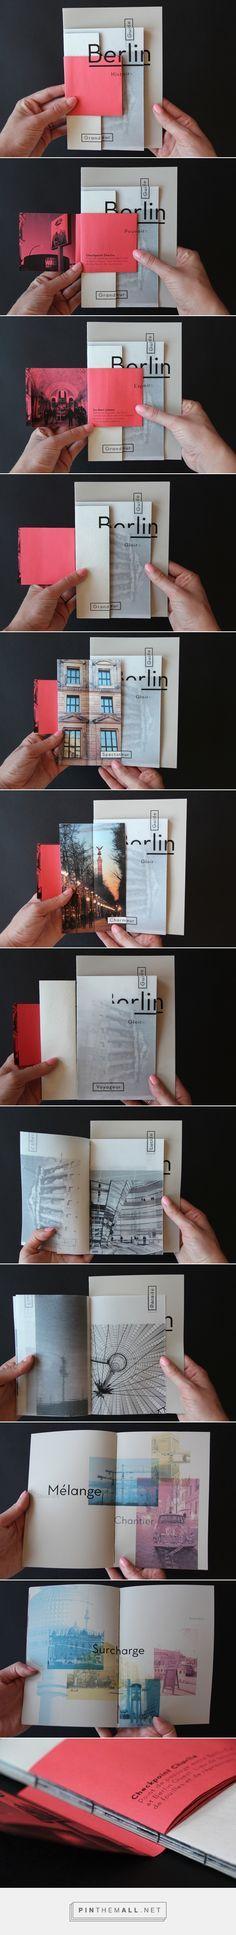 Bewerbung Deckblatt Modern | Bewerbung, Deckblatt bewerbung, Bewerbung design